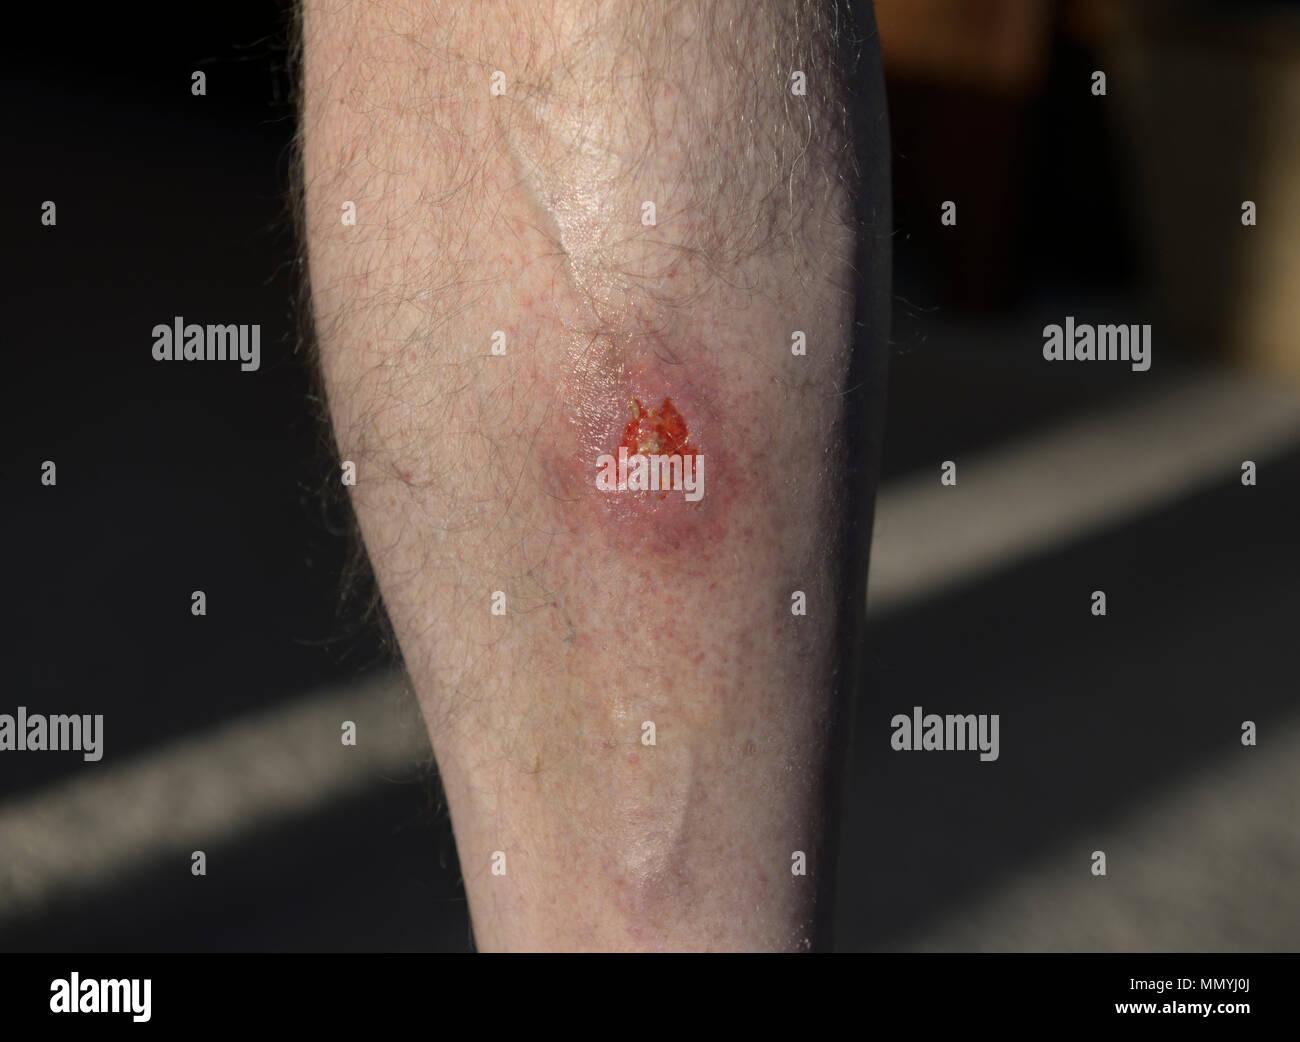 cellulitis infektion